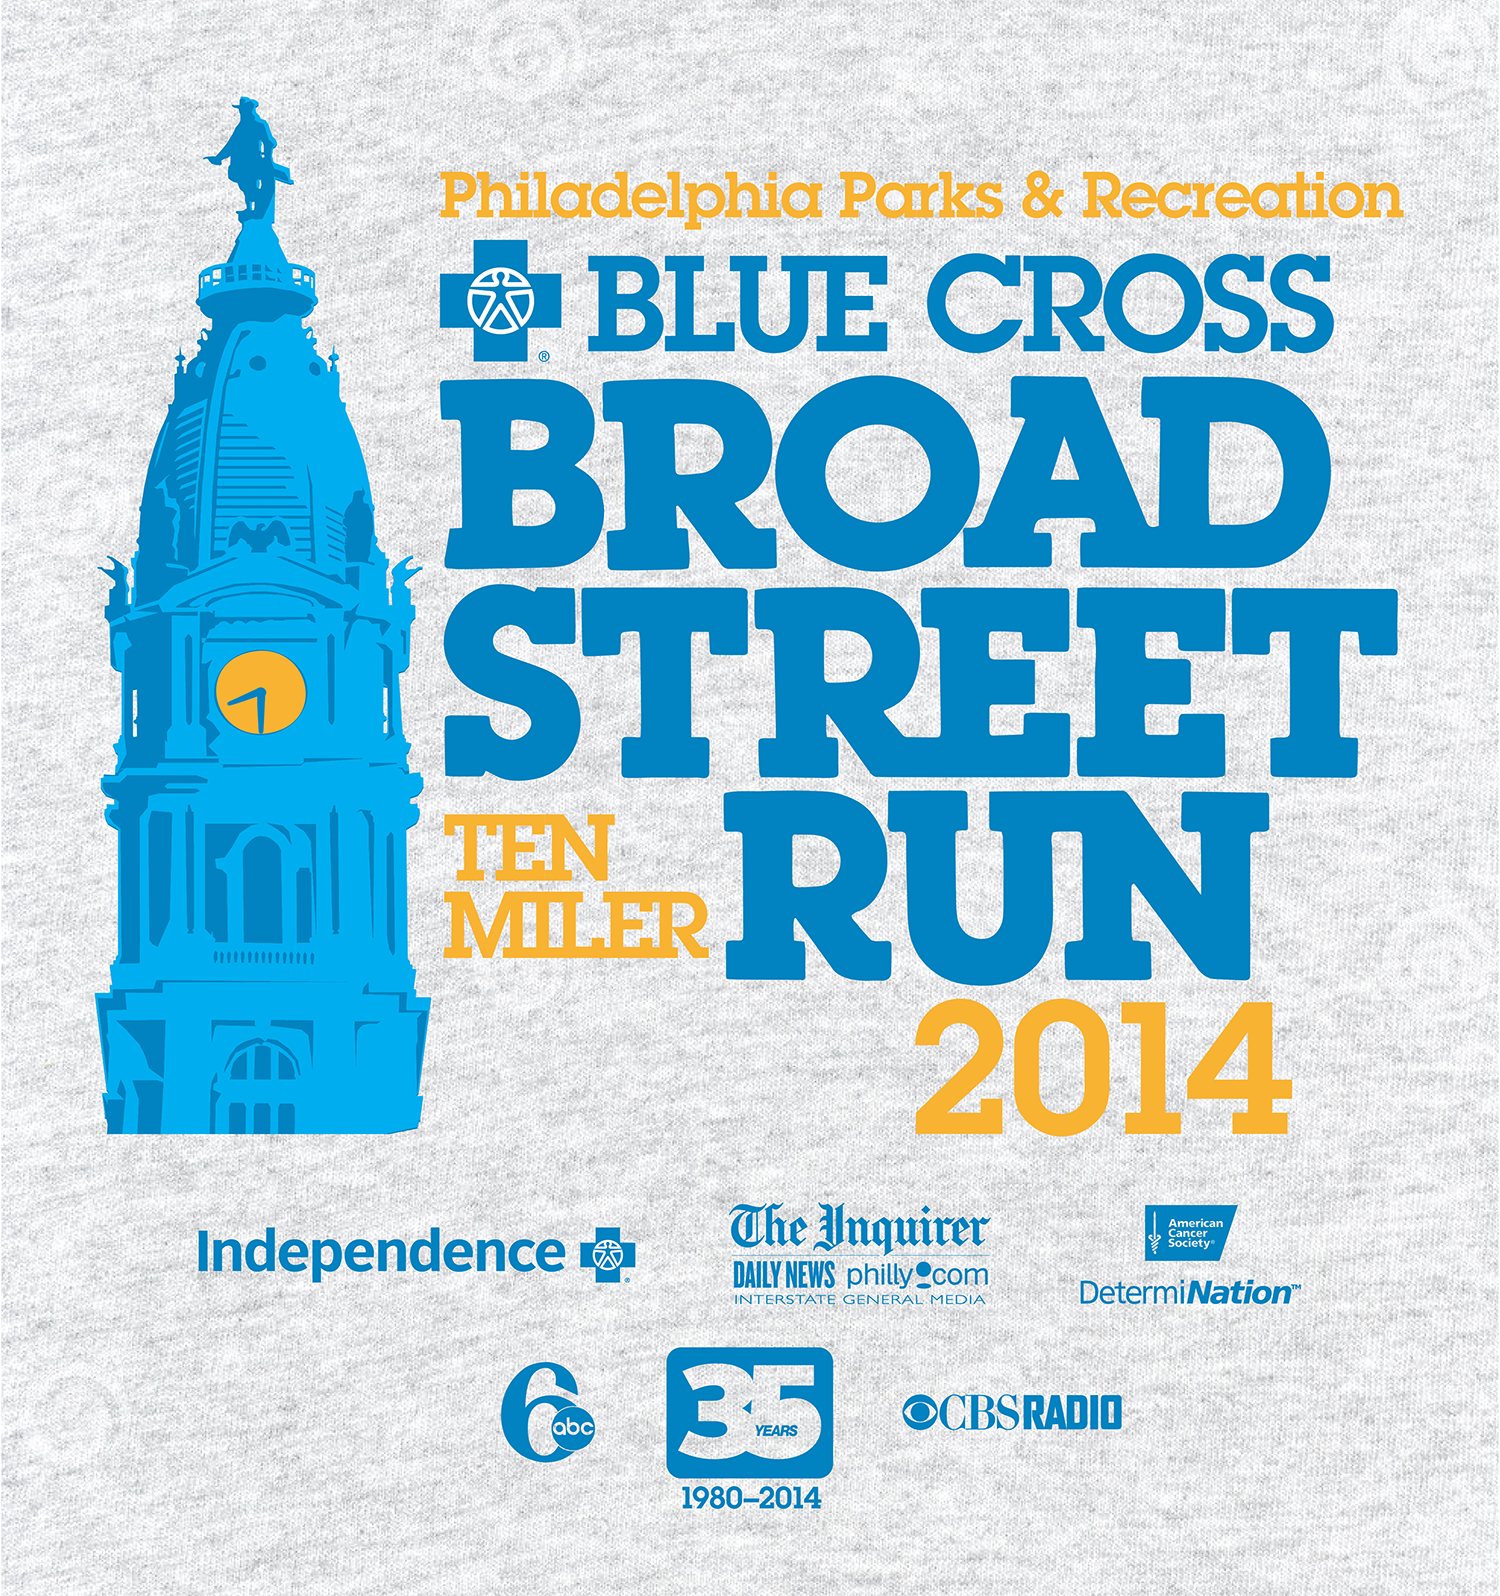 Blue Cross Broad Street Run 2014 35th Anniversary Blue Cross Broad Streets Street Run